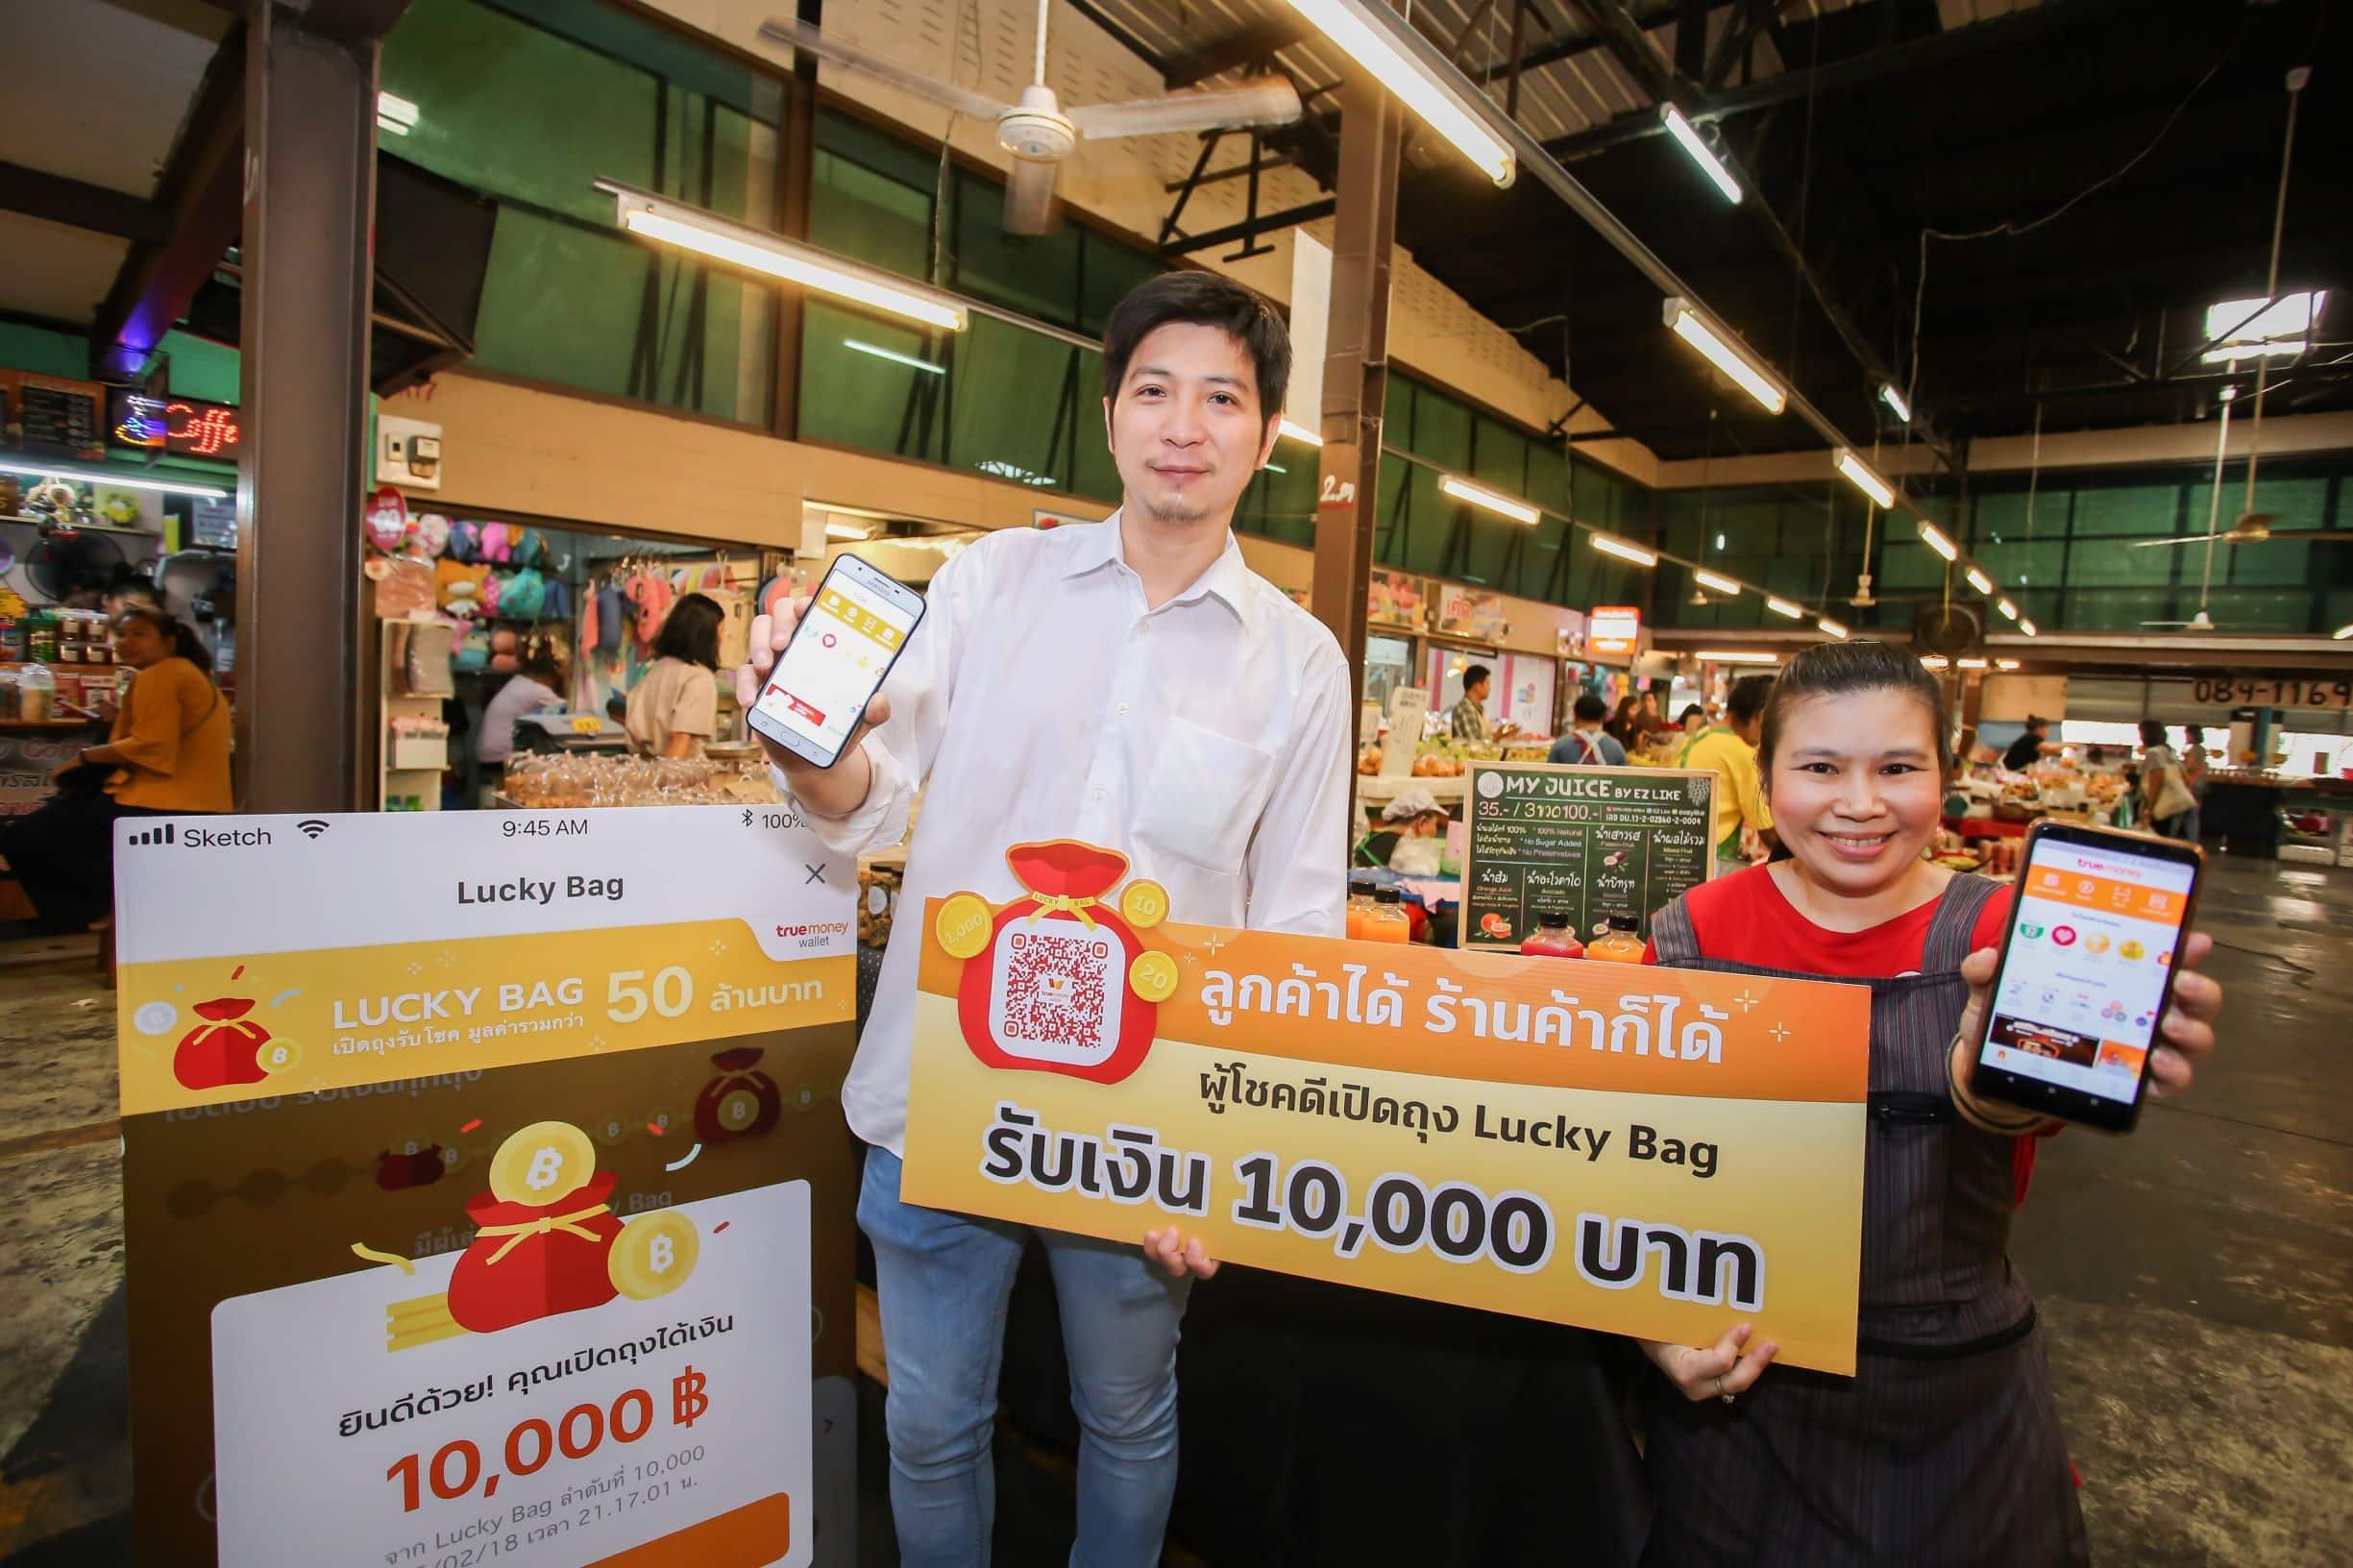 TMN Lucky Bag for Merchant 1 - TrueMoney ร่วมแสดงความยินดีกับร้านค้าผู้โชคดี ได้รับเงิน 10,000 บาท ในแคมเปญ Lucky Bag